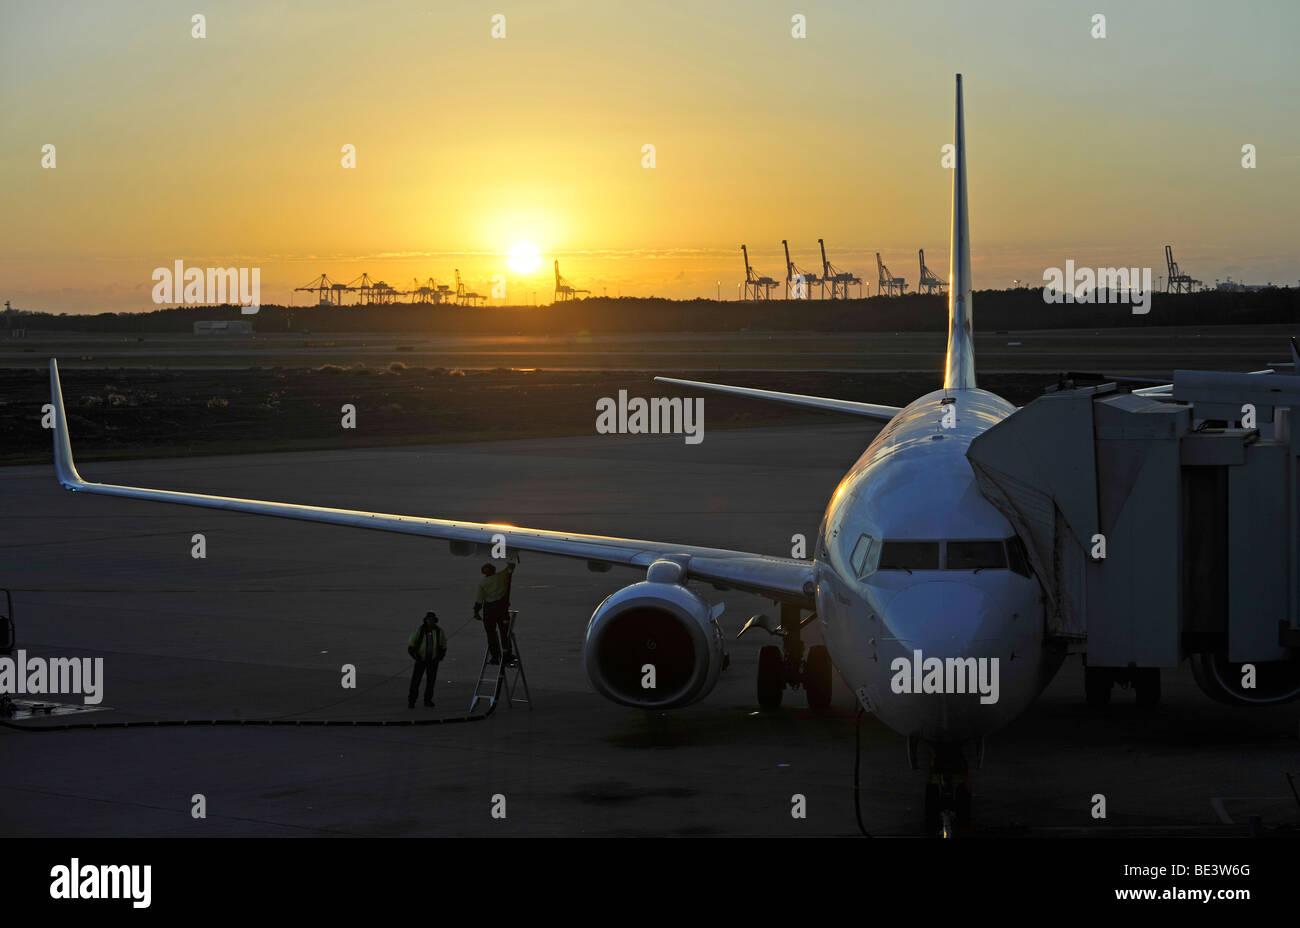 Qantas Airlines Boeing 717 refueling at sunrise, Brisbane International Airport, cranes in the rear, harbour, Brisbane, - Stock Image